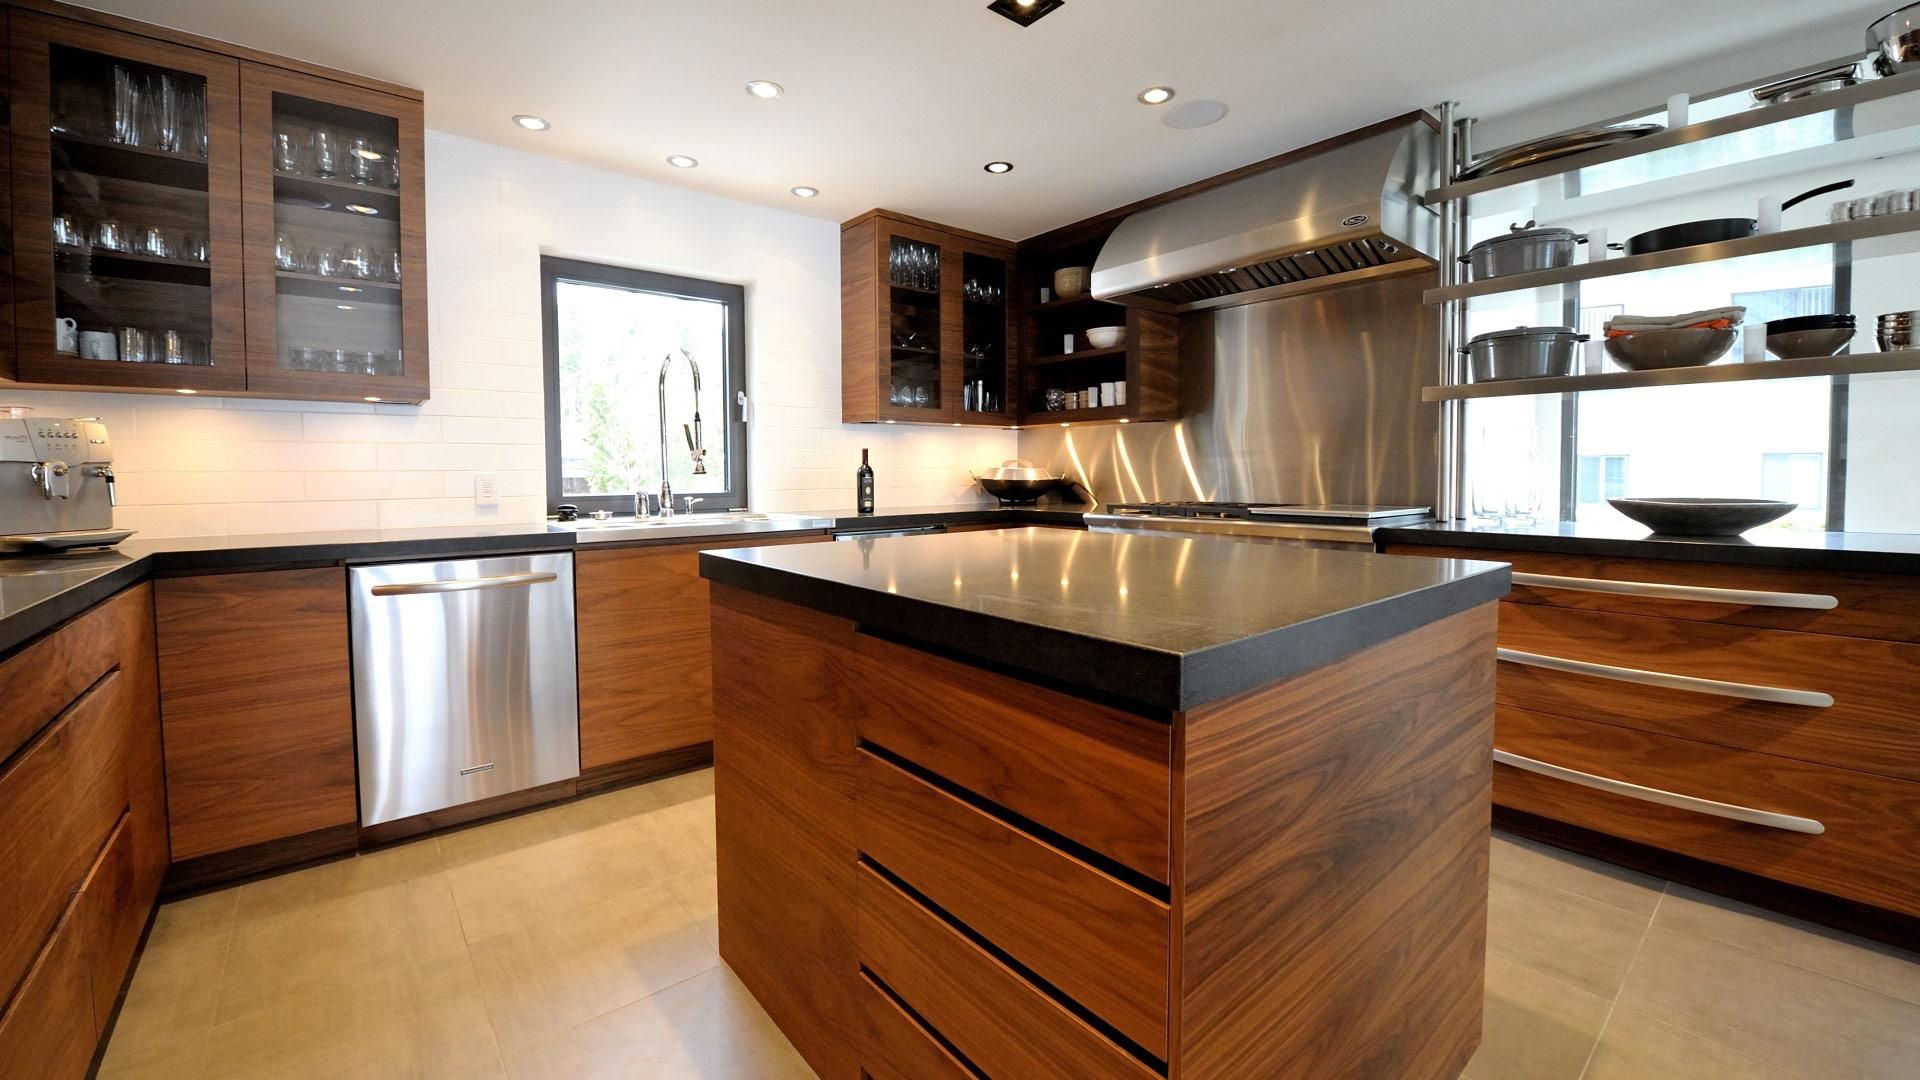 modele cuisine bois et inox lille maison. Black Bedroom Furniture Sets. Home Design Ideas